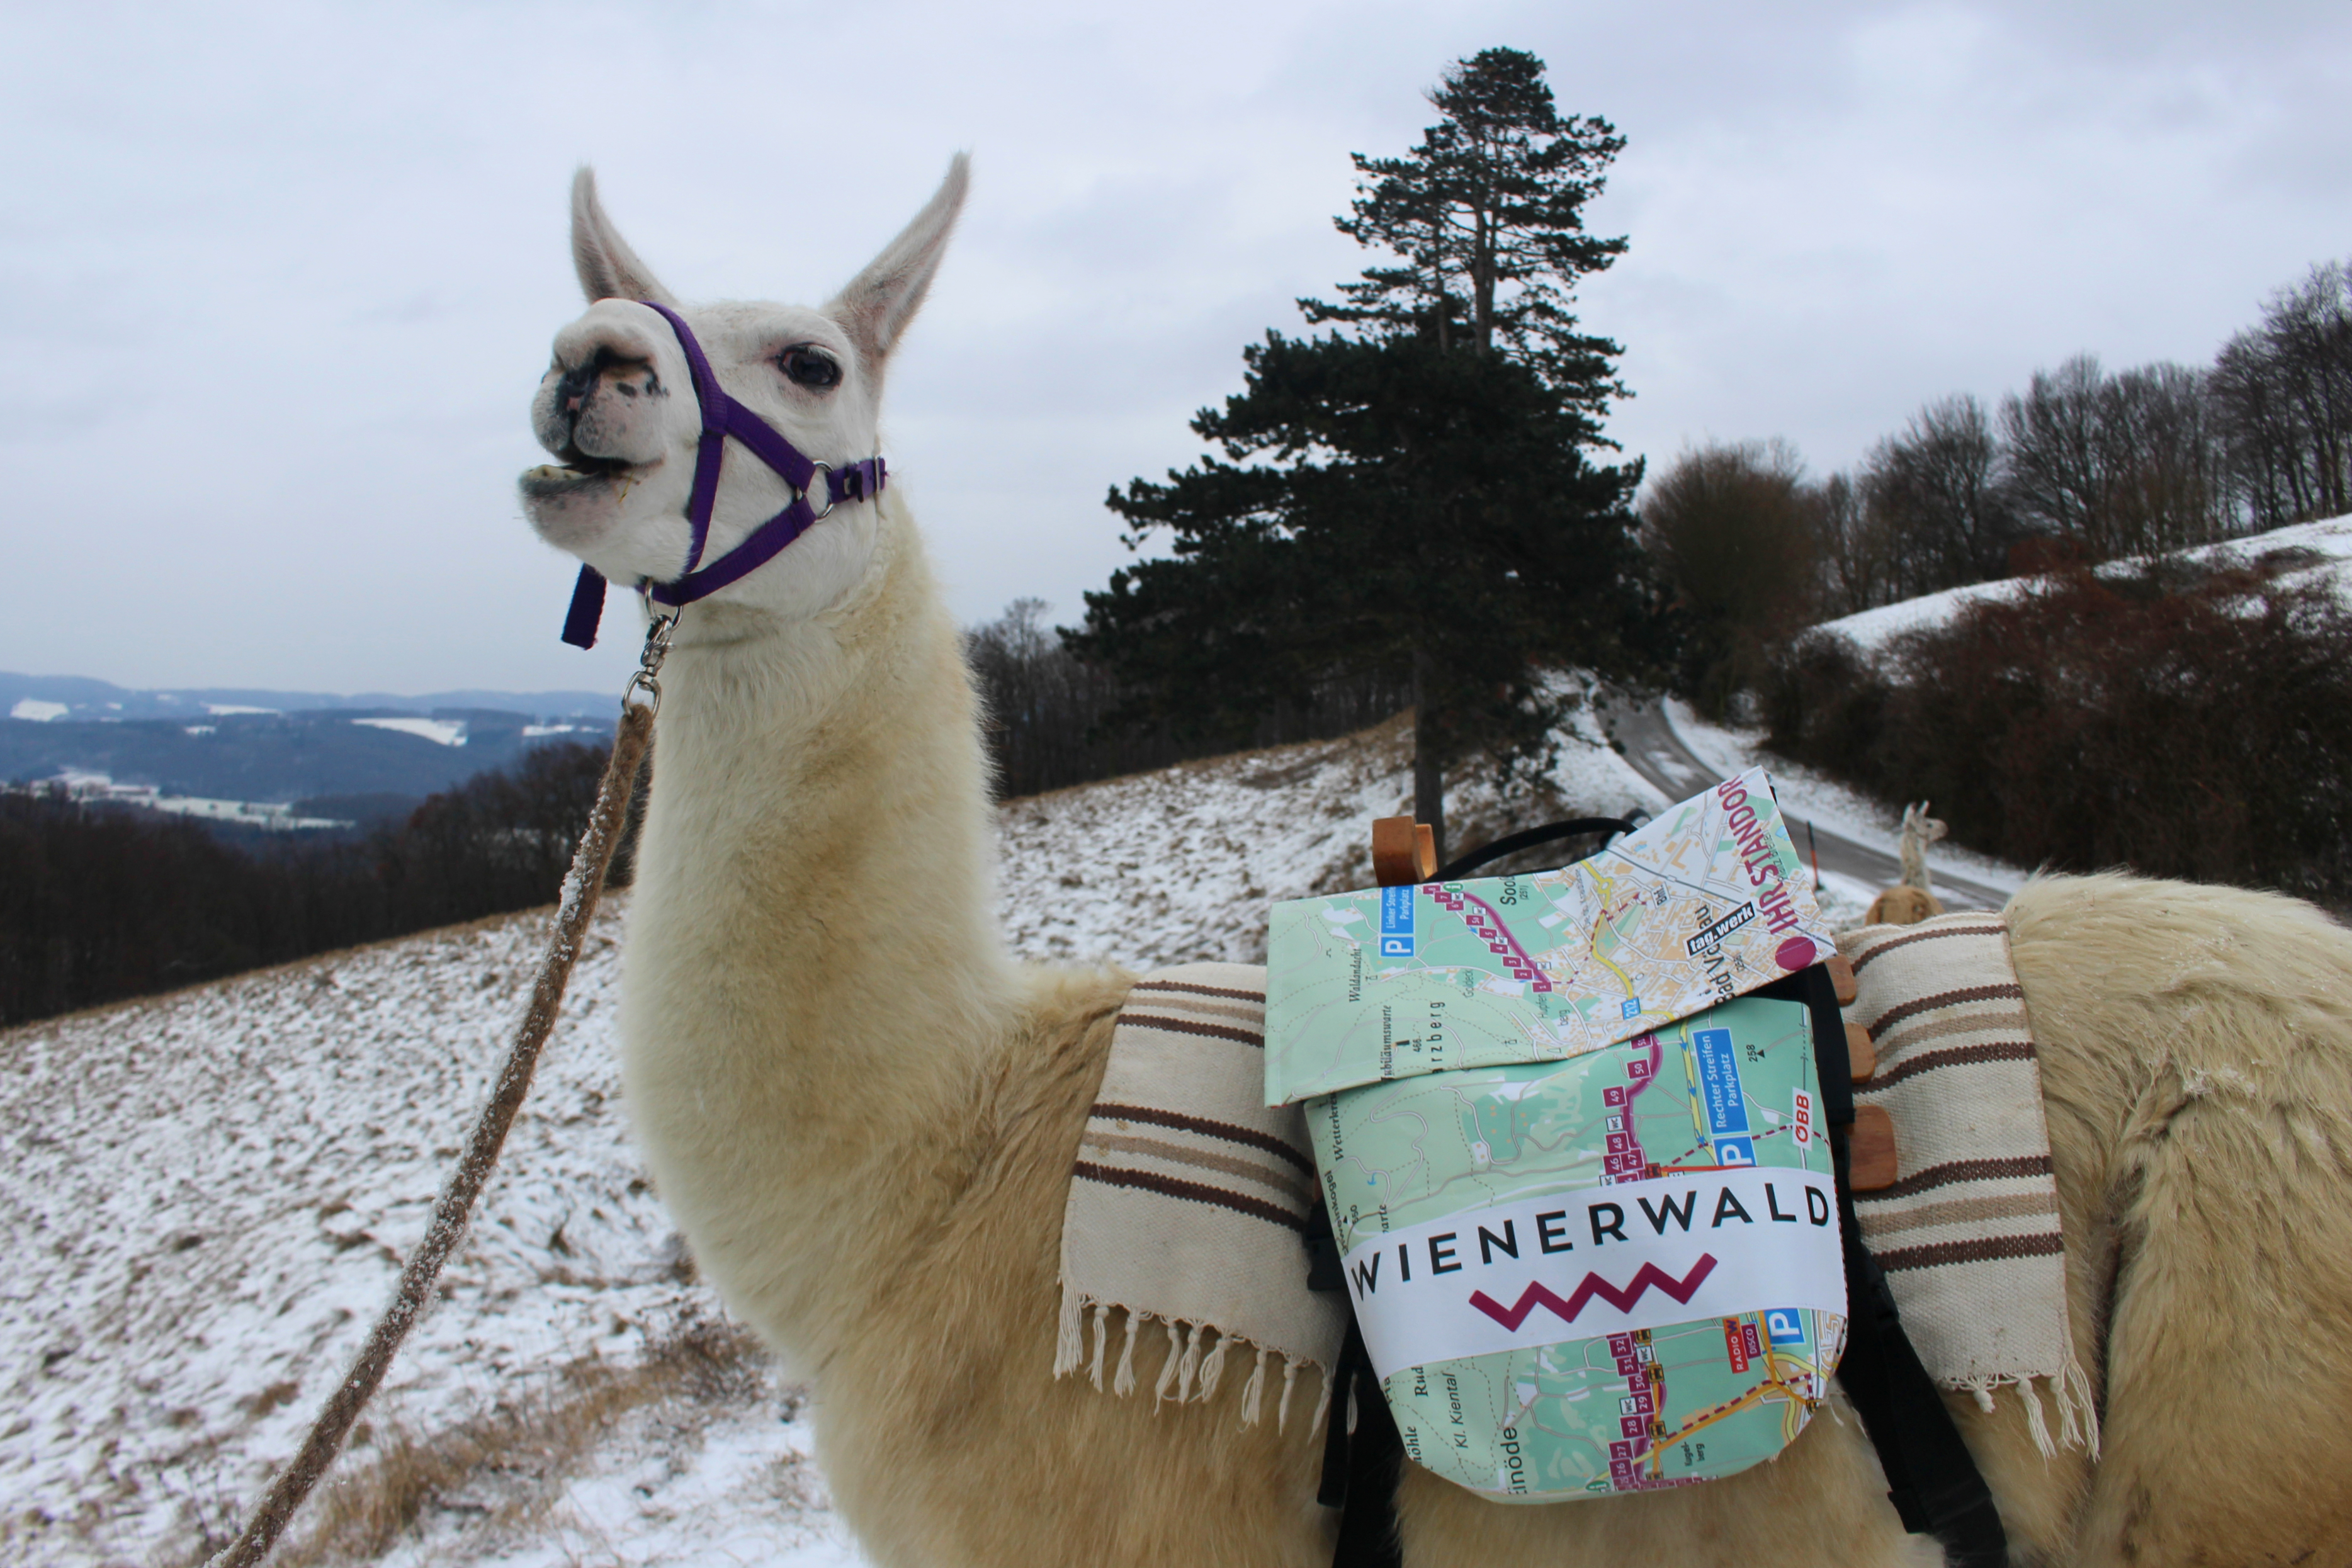 Blogartikel zu Wienerwald - carolinavolksfolks.com